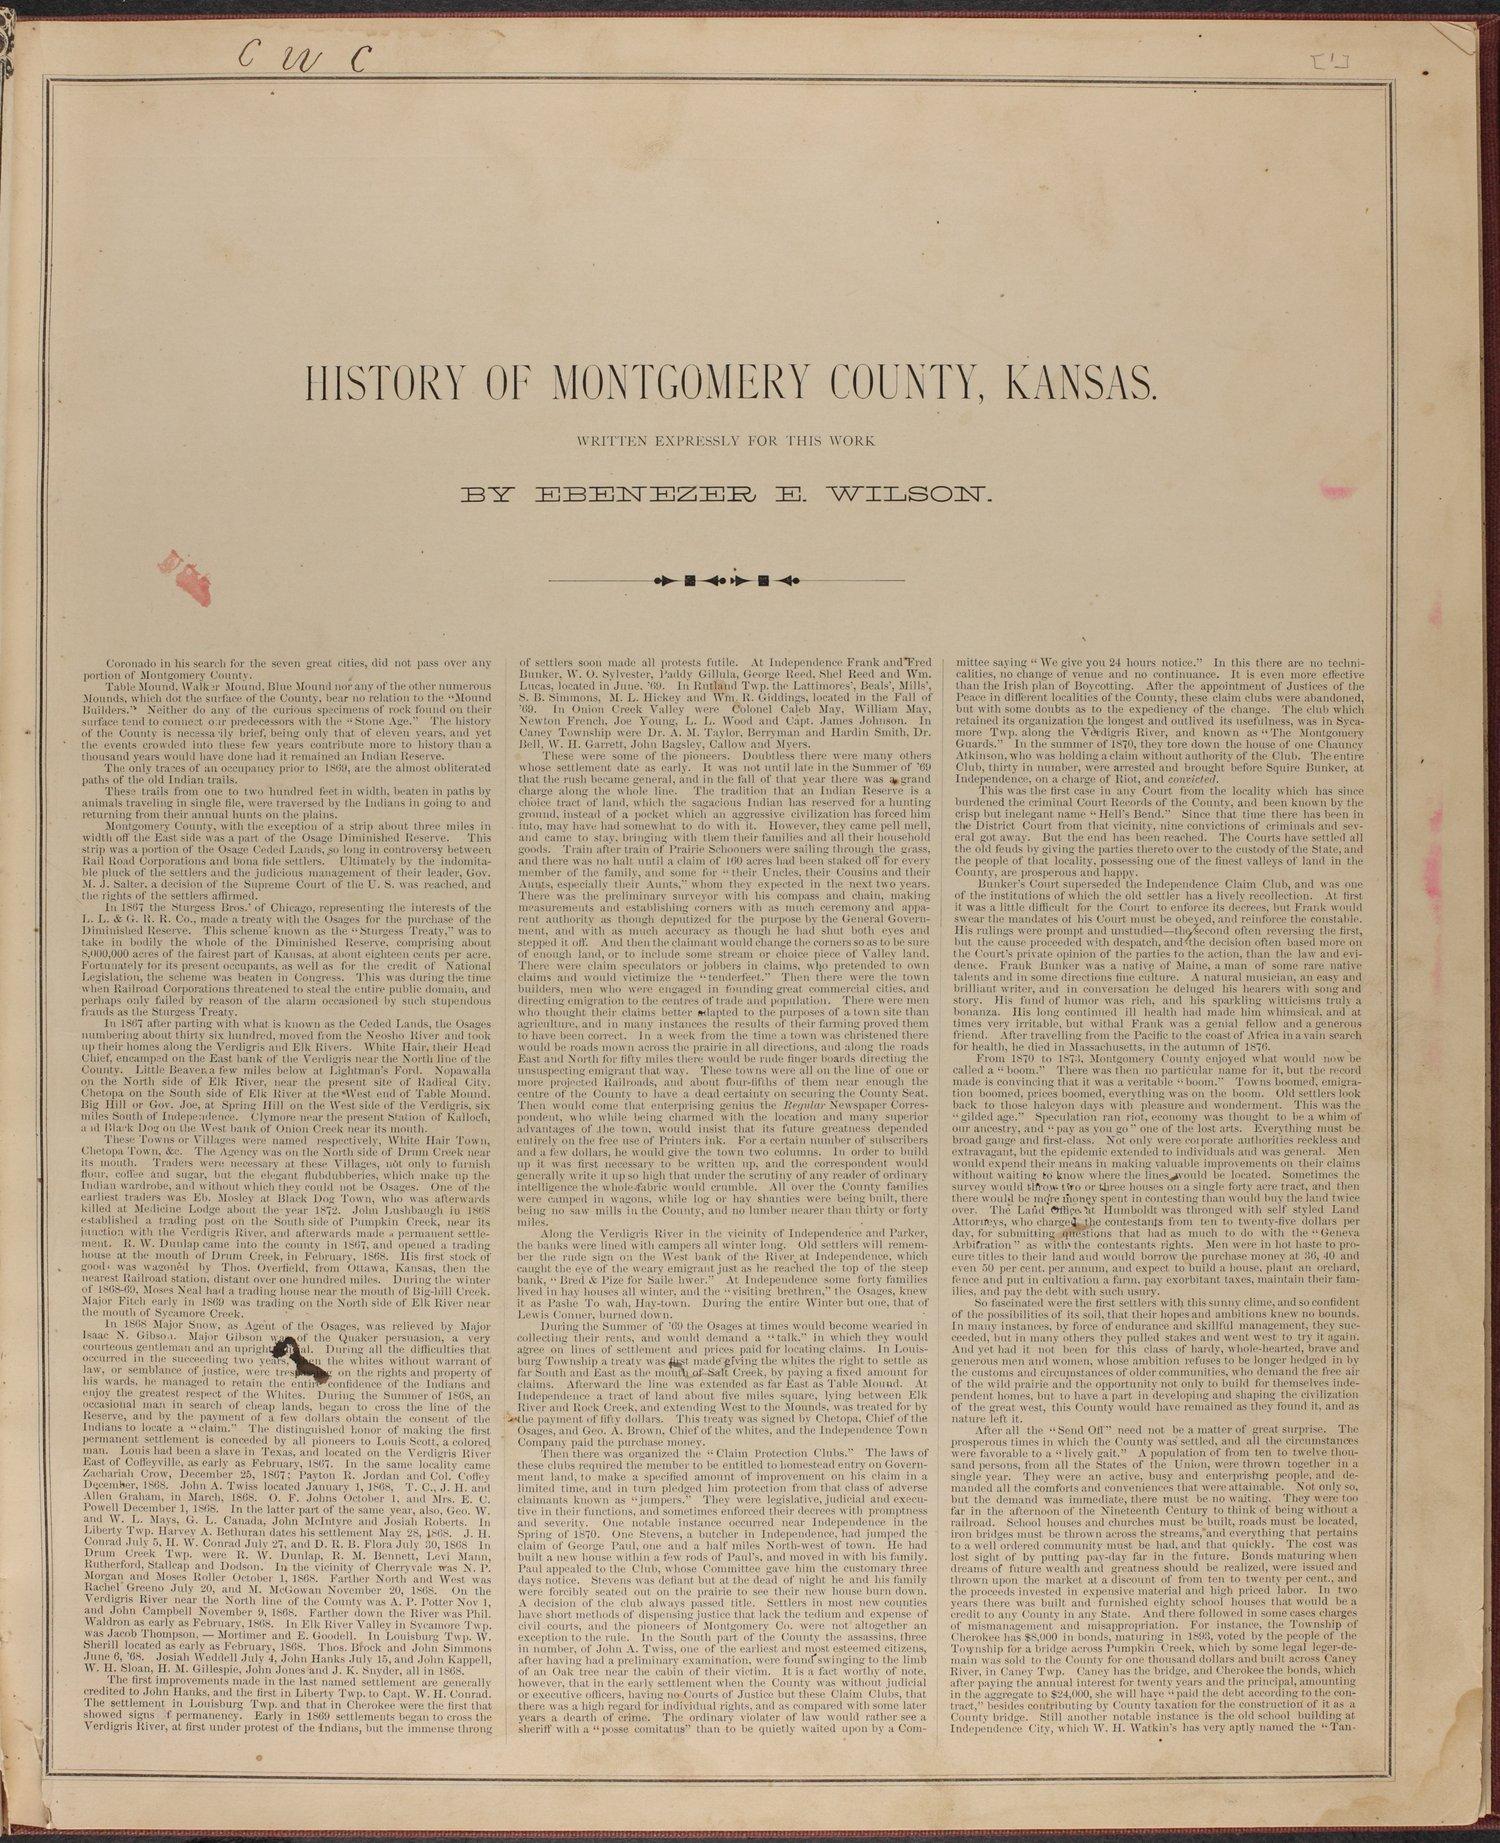 Historical atlas of Montgomery County, Kansas - 7